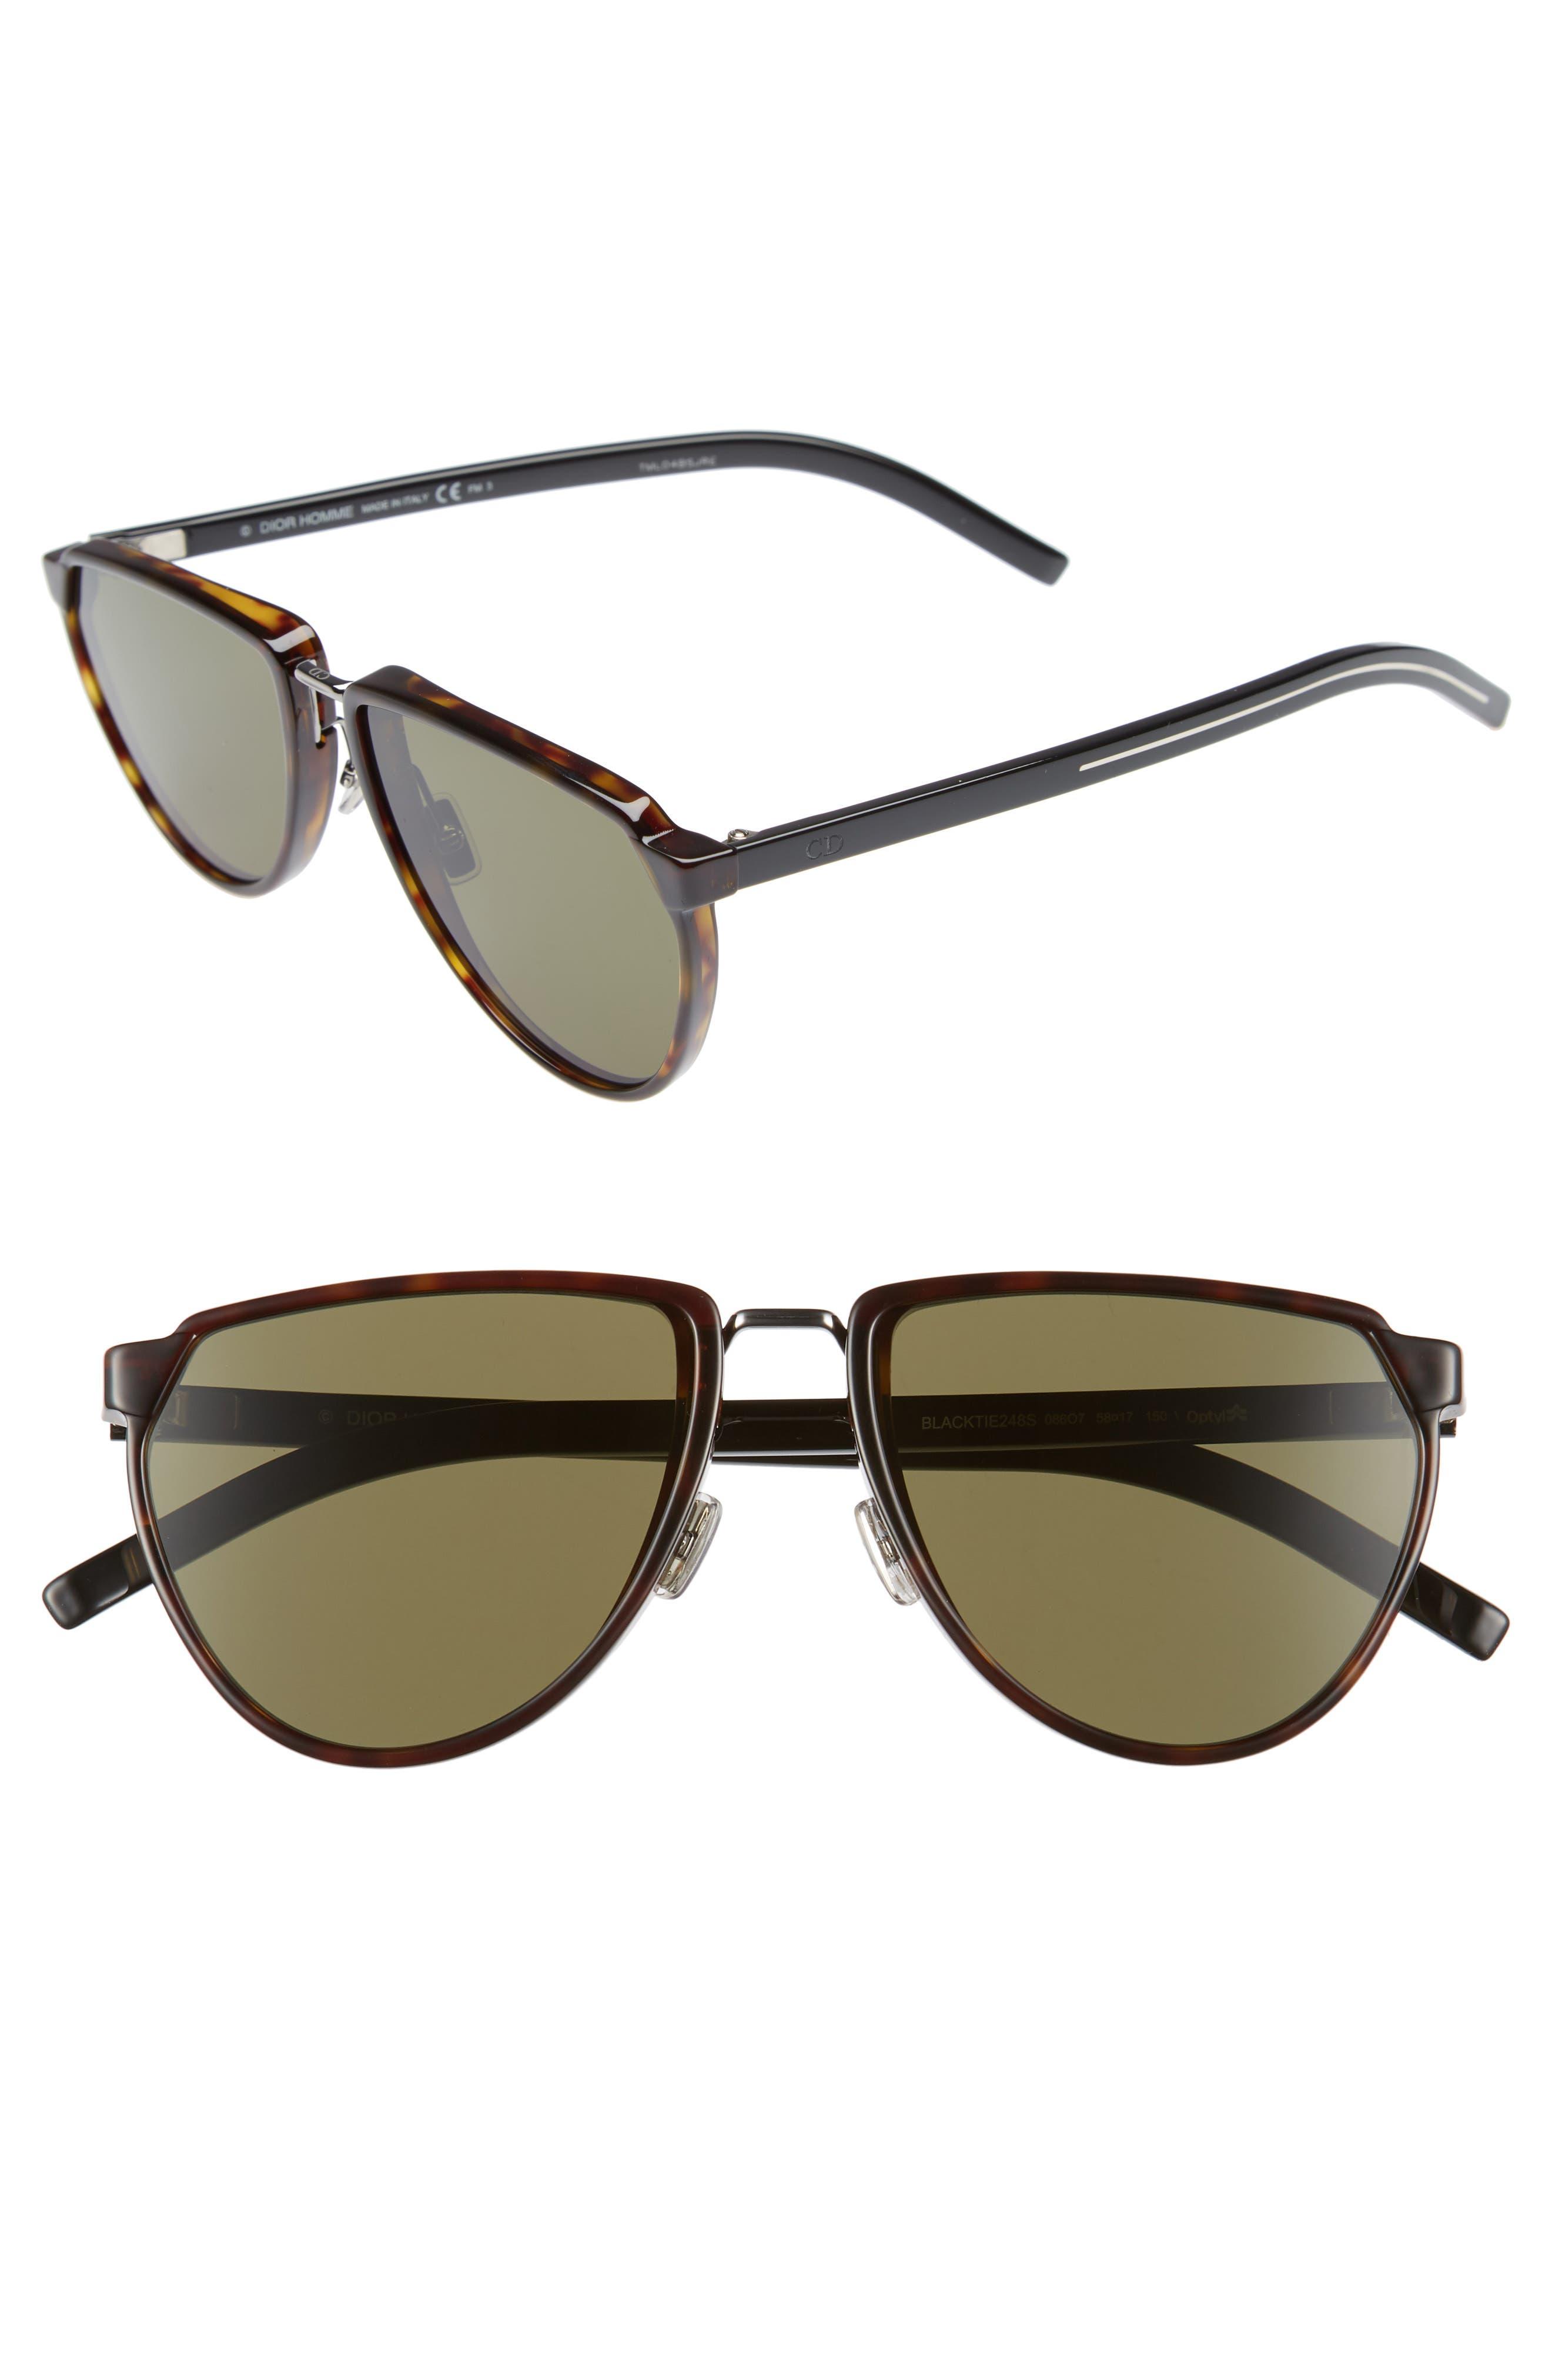 DIOR HOMME 58Mm Sunglasses - Dark Havana